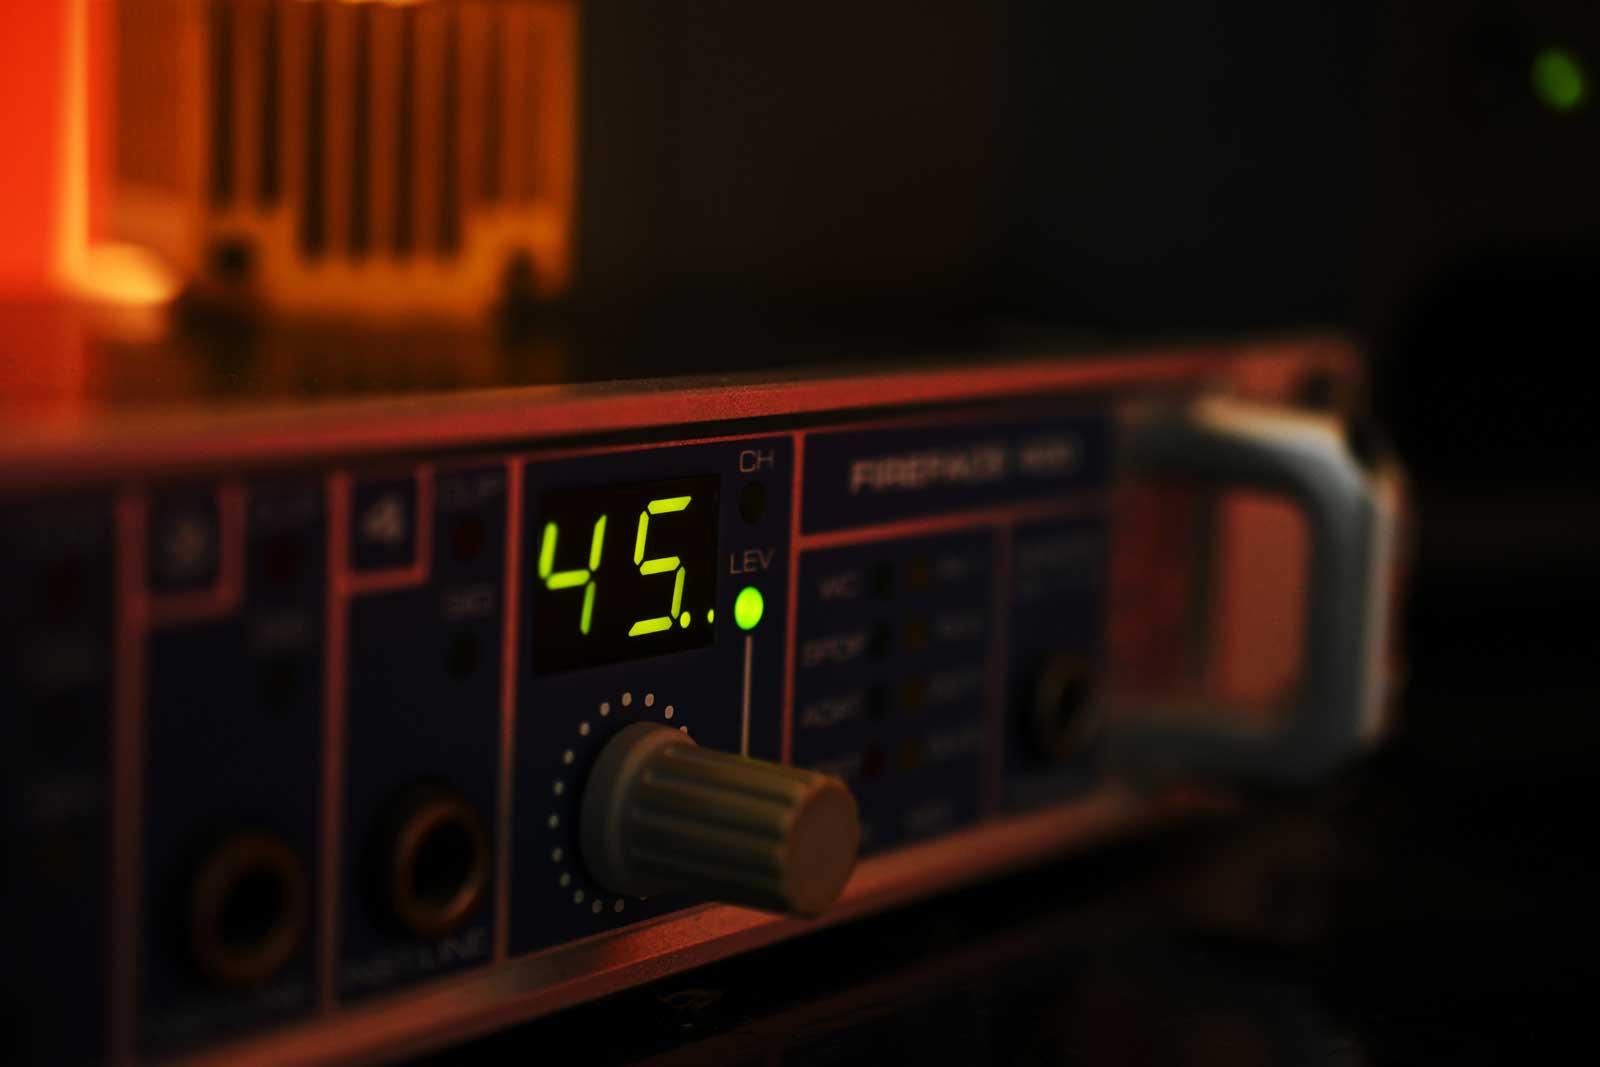 Sound card rme